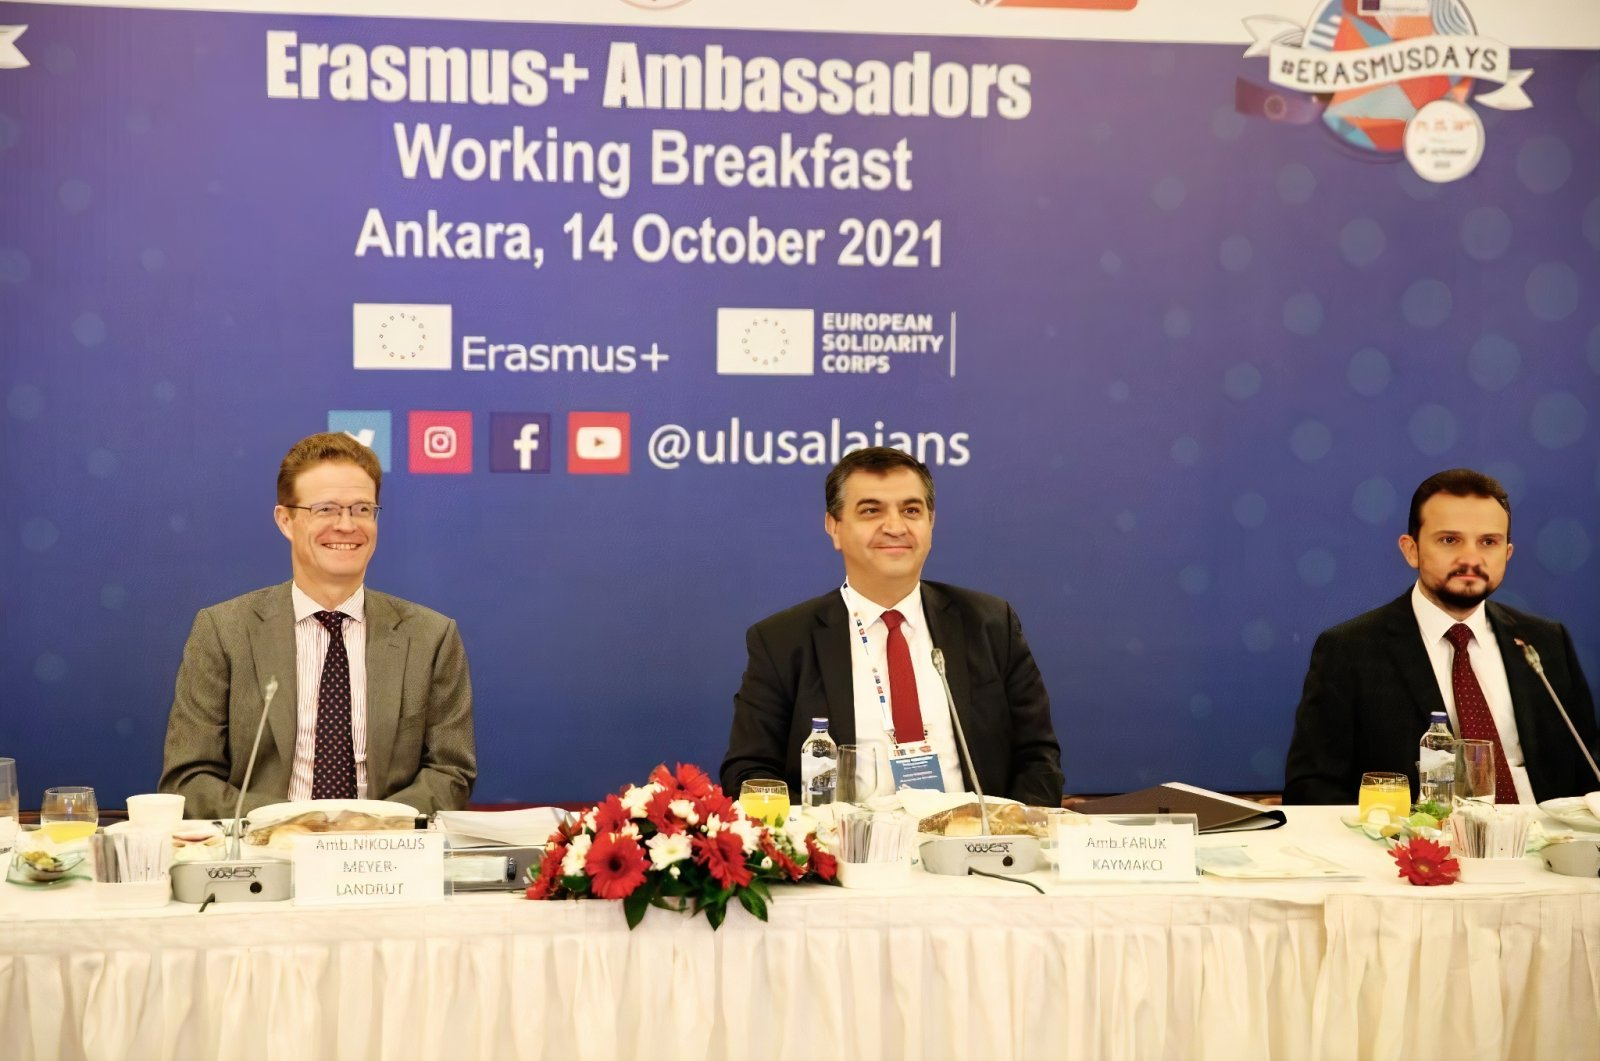 Head of the EU Delegation to Turkey Ambassador Nikolaus Meyer-Landrut (L) and Deputy Foreign Minister Faruk Kaymakcı (C) attend the ERASMUS  Ambassadors Working Breakfast in Ankara, Turkey, Oct. 14, 2021. (Twitter @EUDelegationTur)